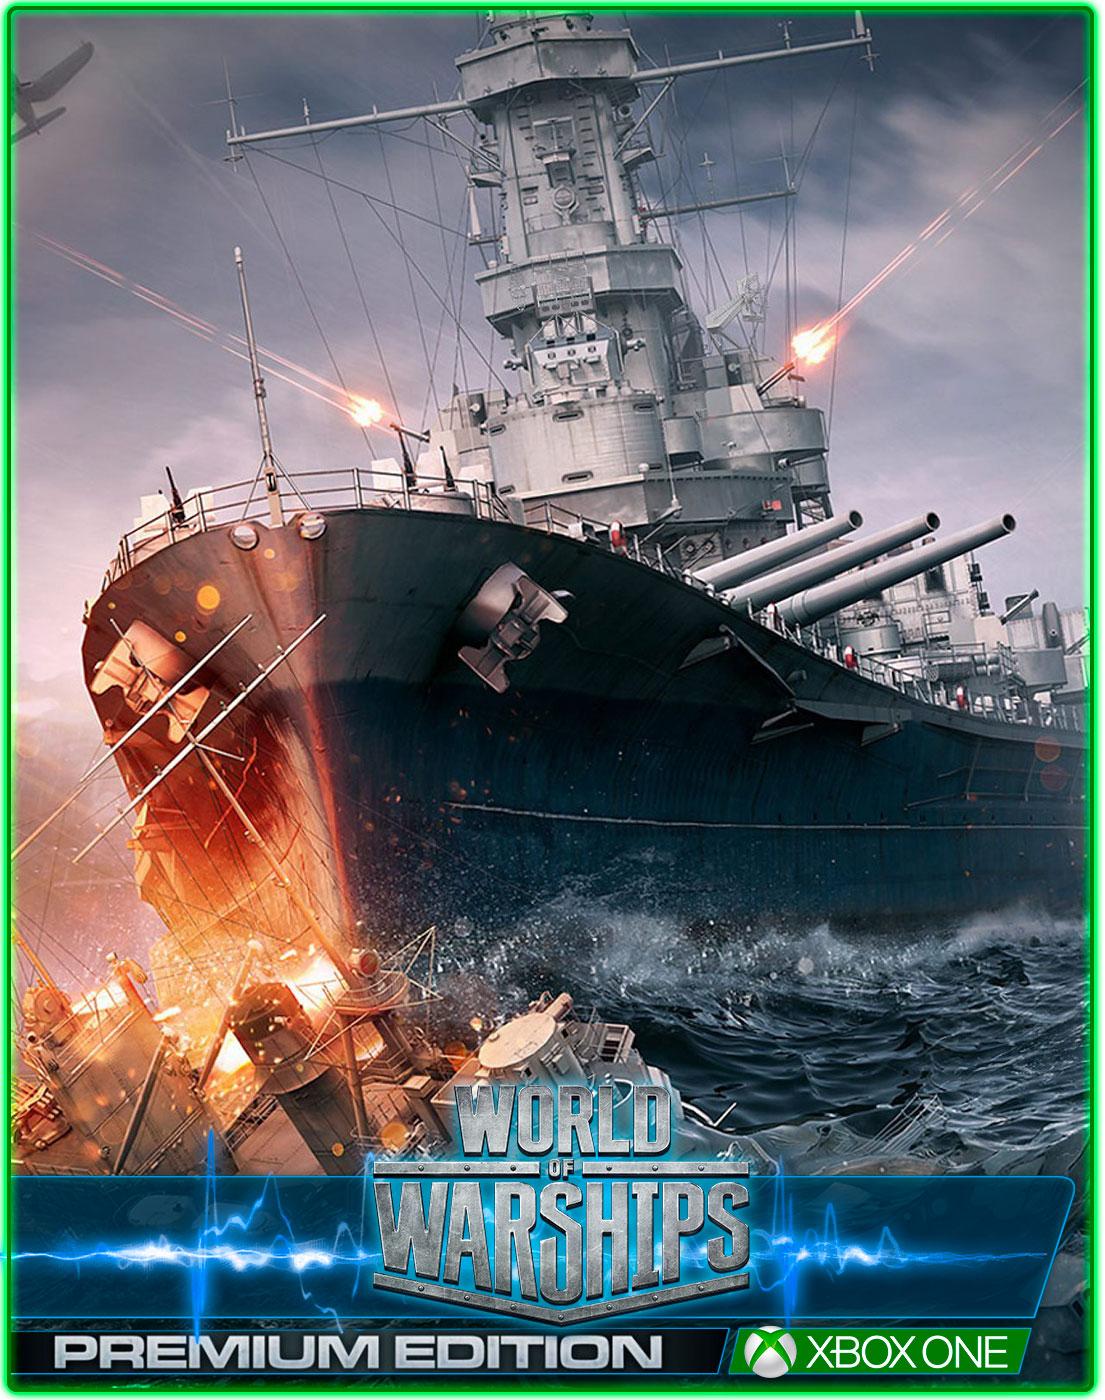 World of Warships Legends Premium(XBOX ONE) 2019